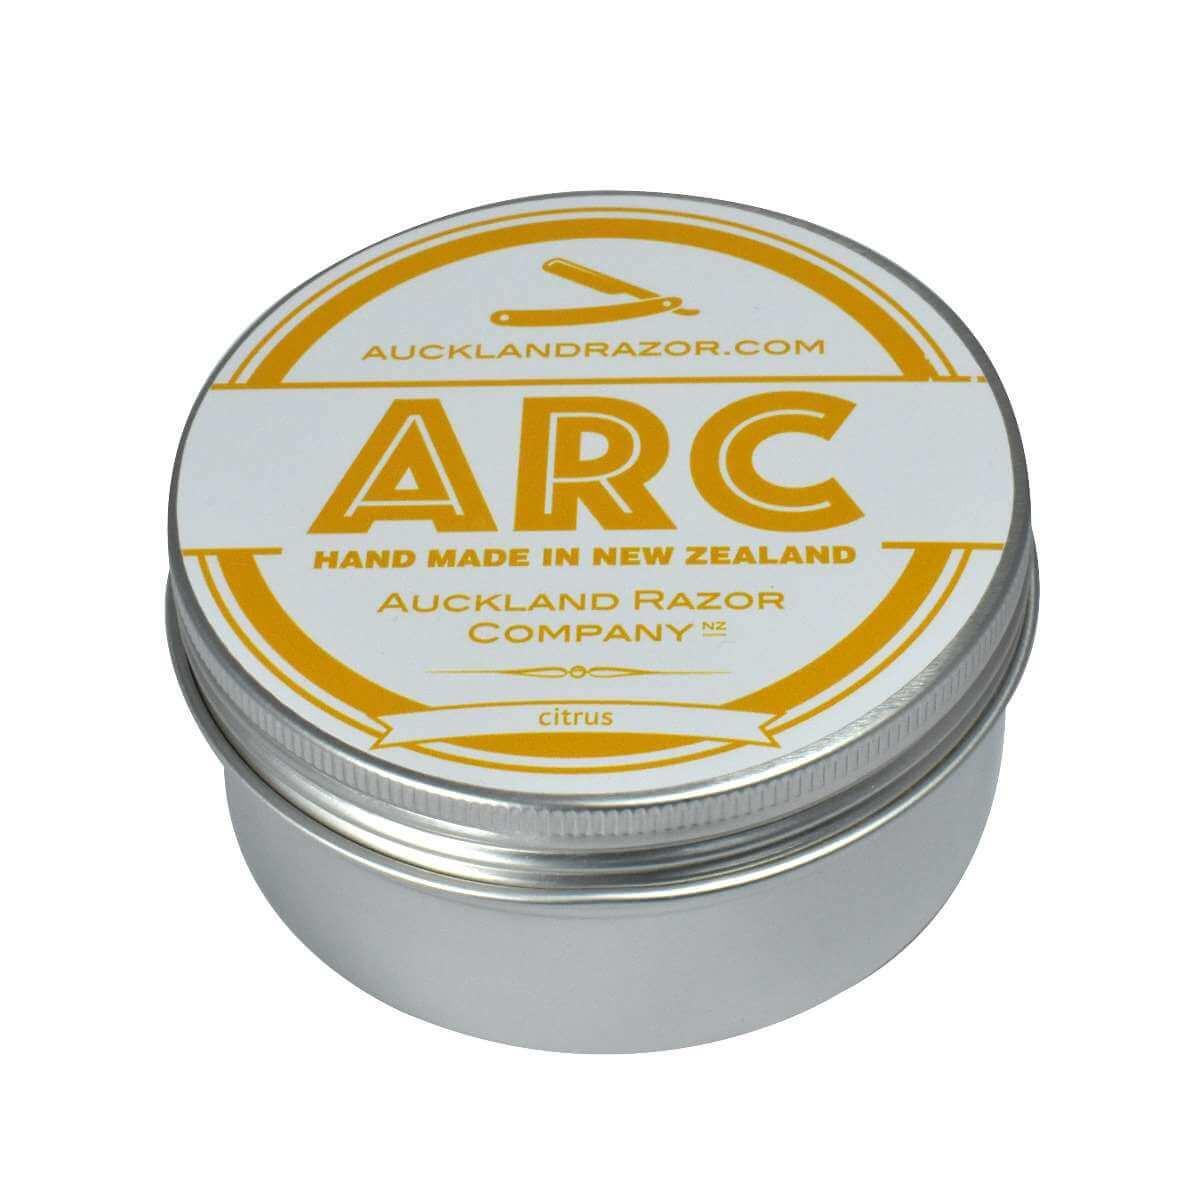 Auckland Razor Company Citrus Shaving Soap